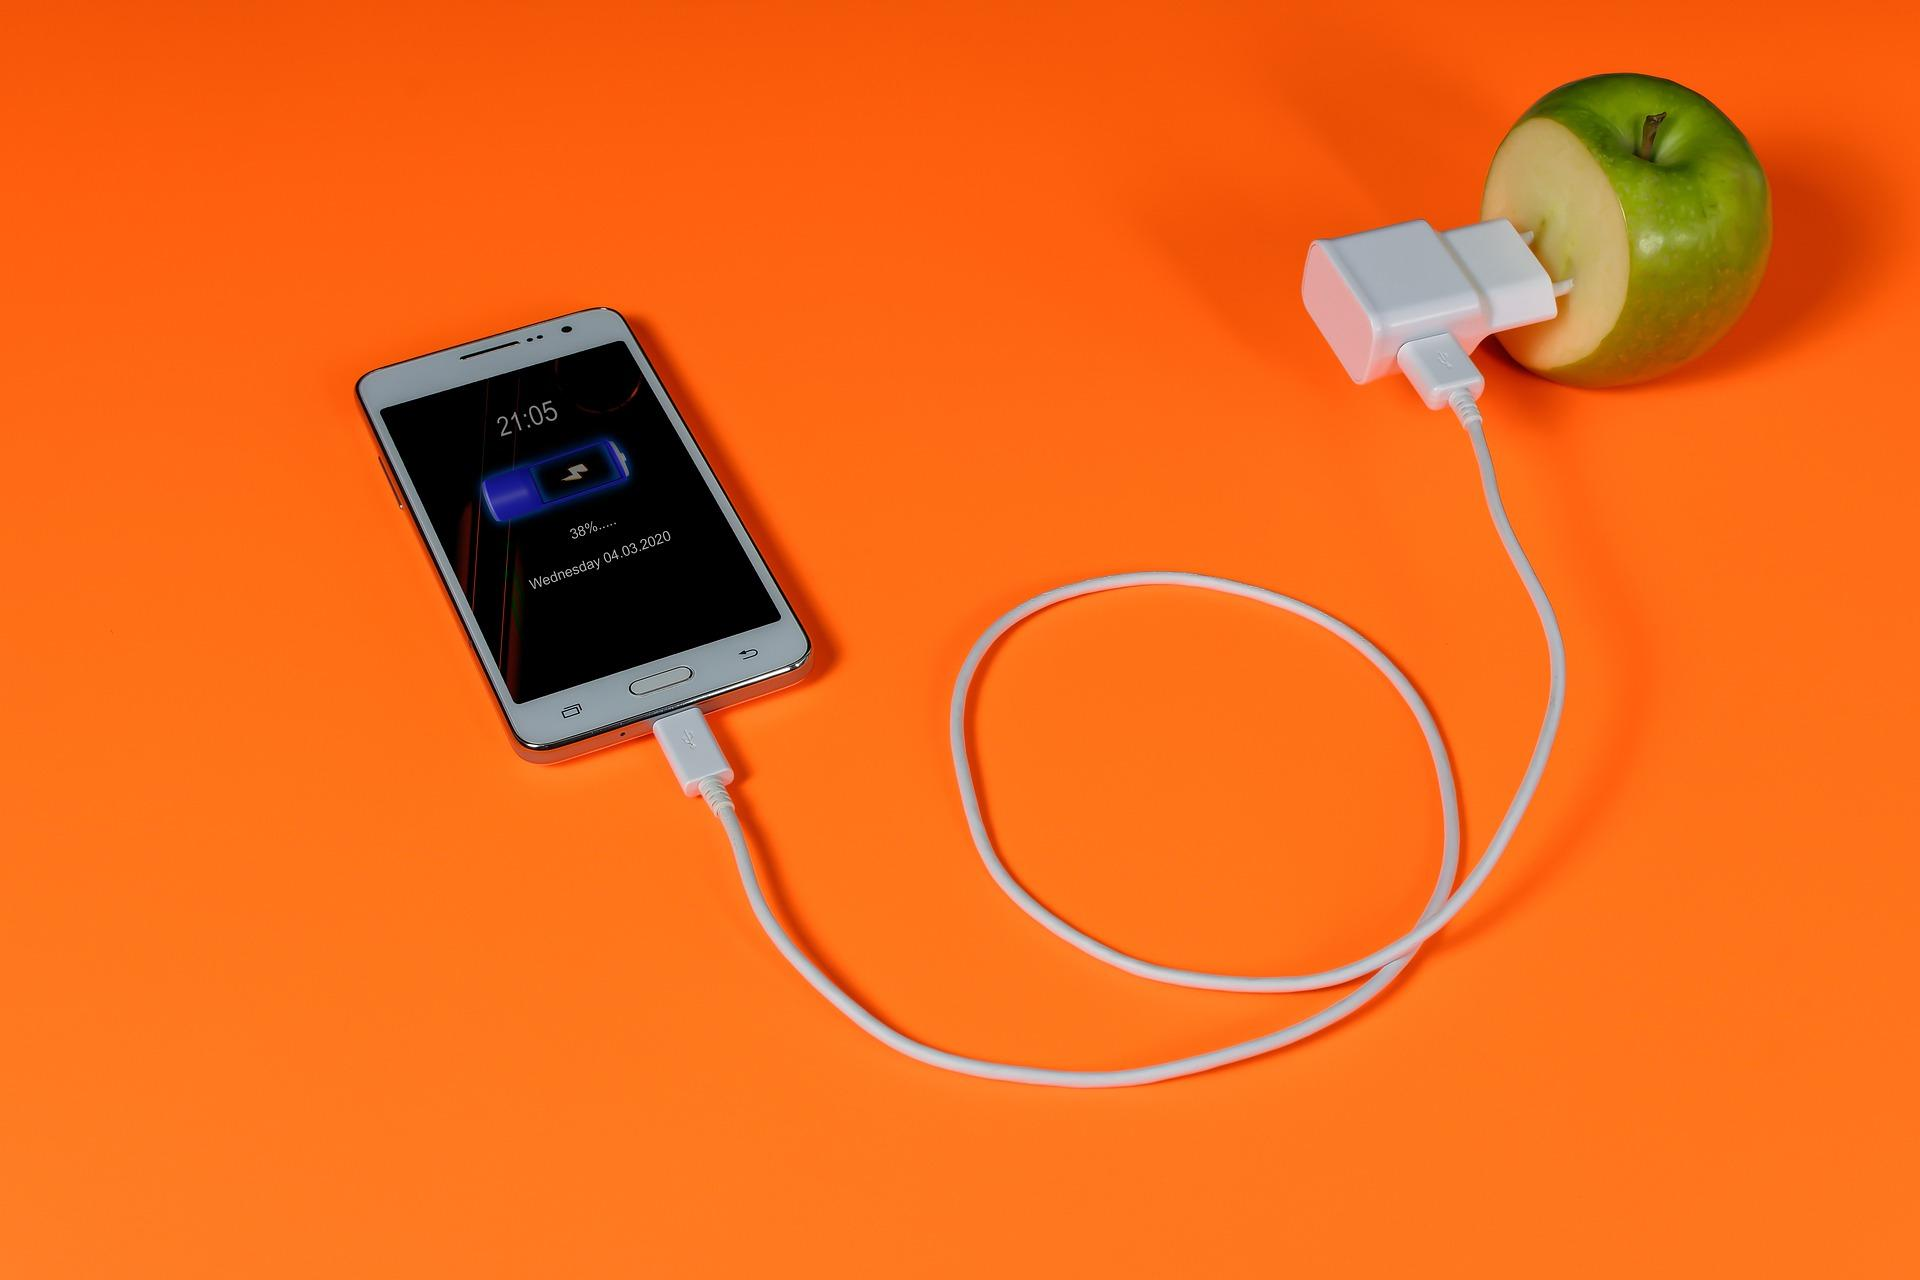 5 причин, по которым Android популярнее iPhone